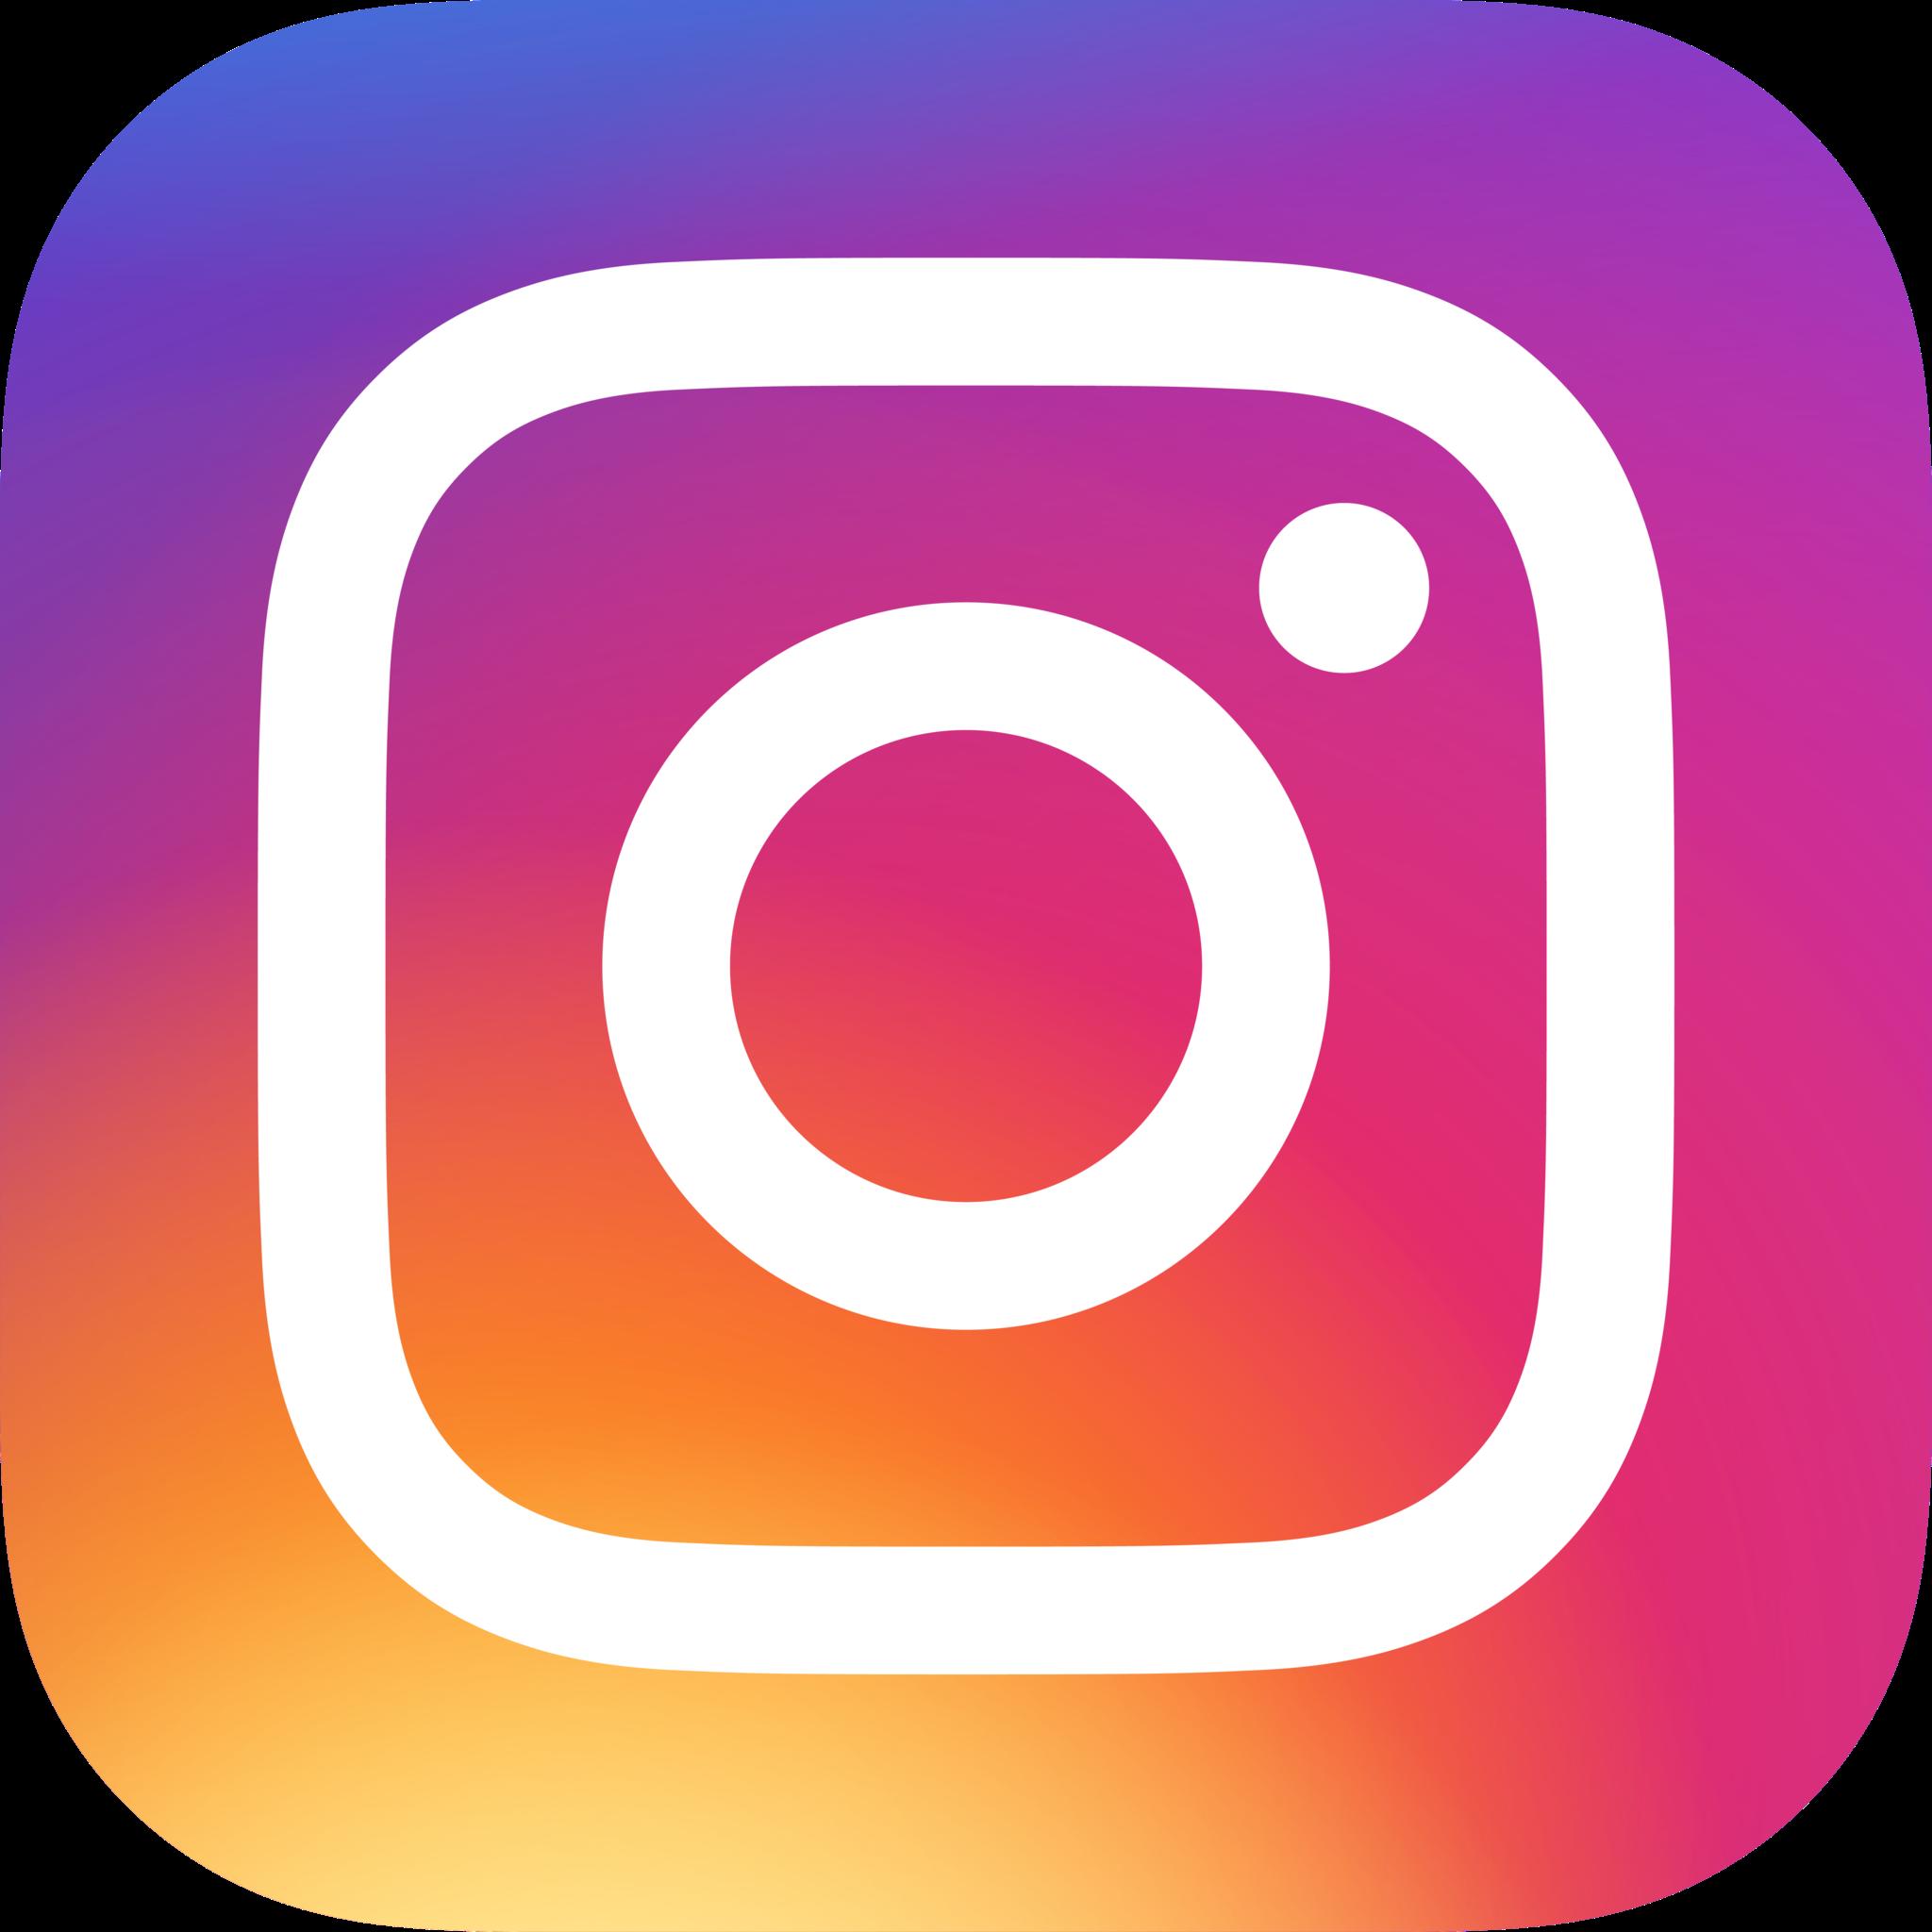 @insavousfaitlespoches Instagram Link Thumbnail | Linktree